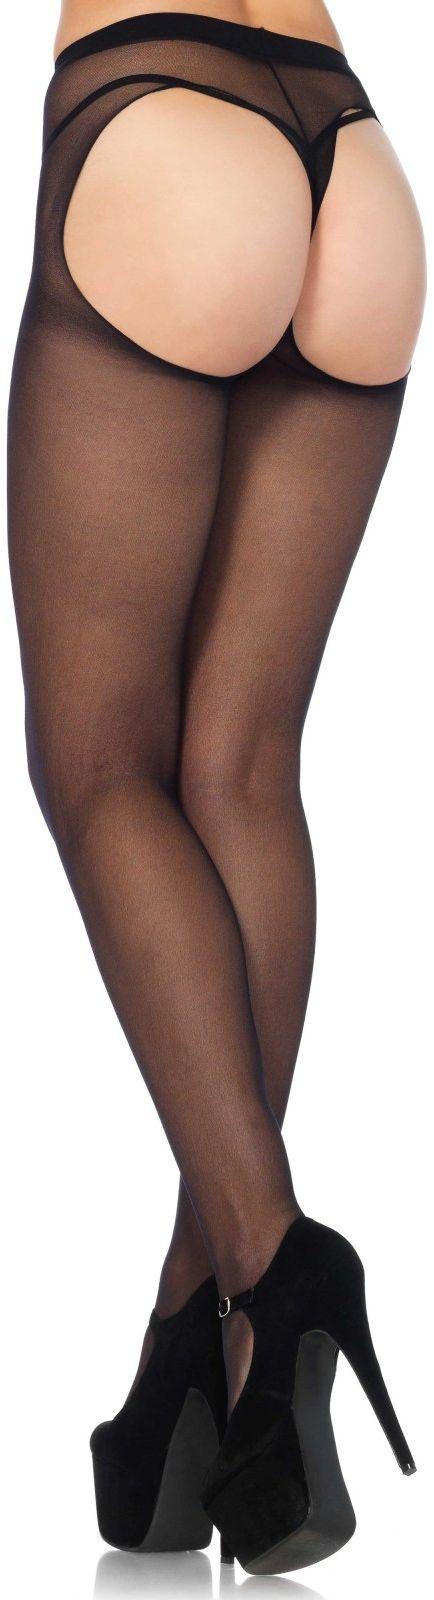 Leg Avenue Sheer Thong Back Pantyhose 1902 Black